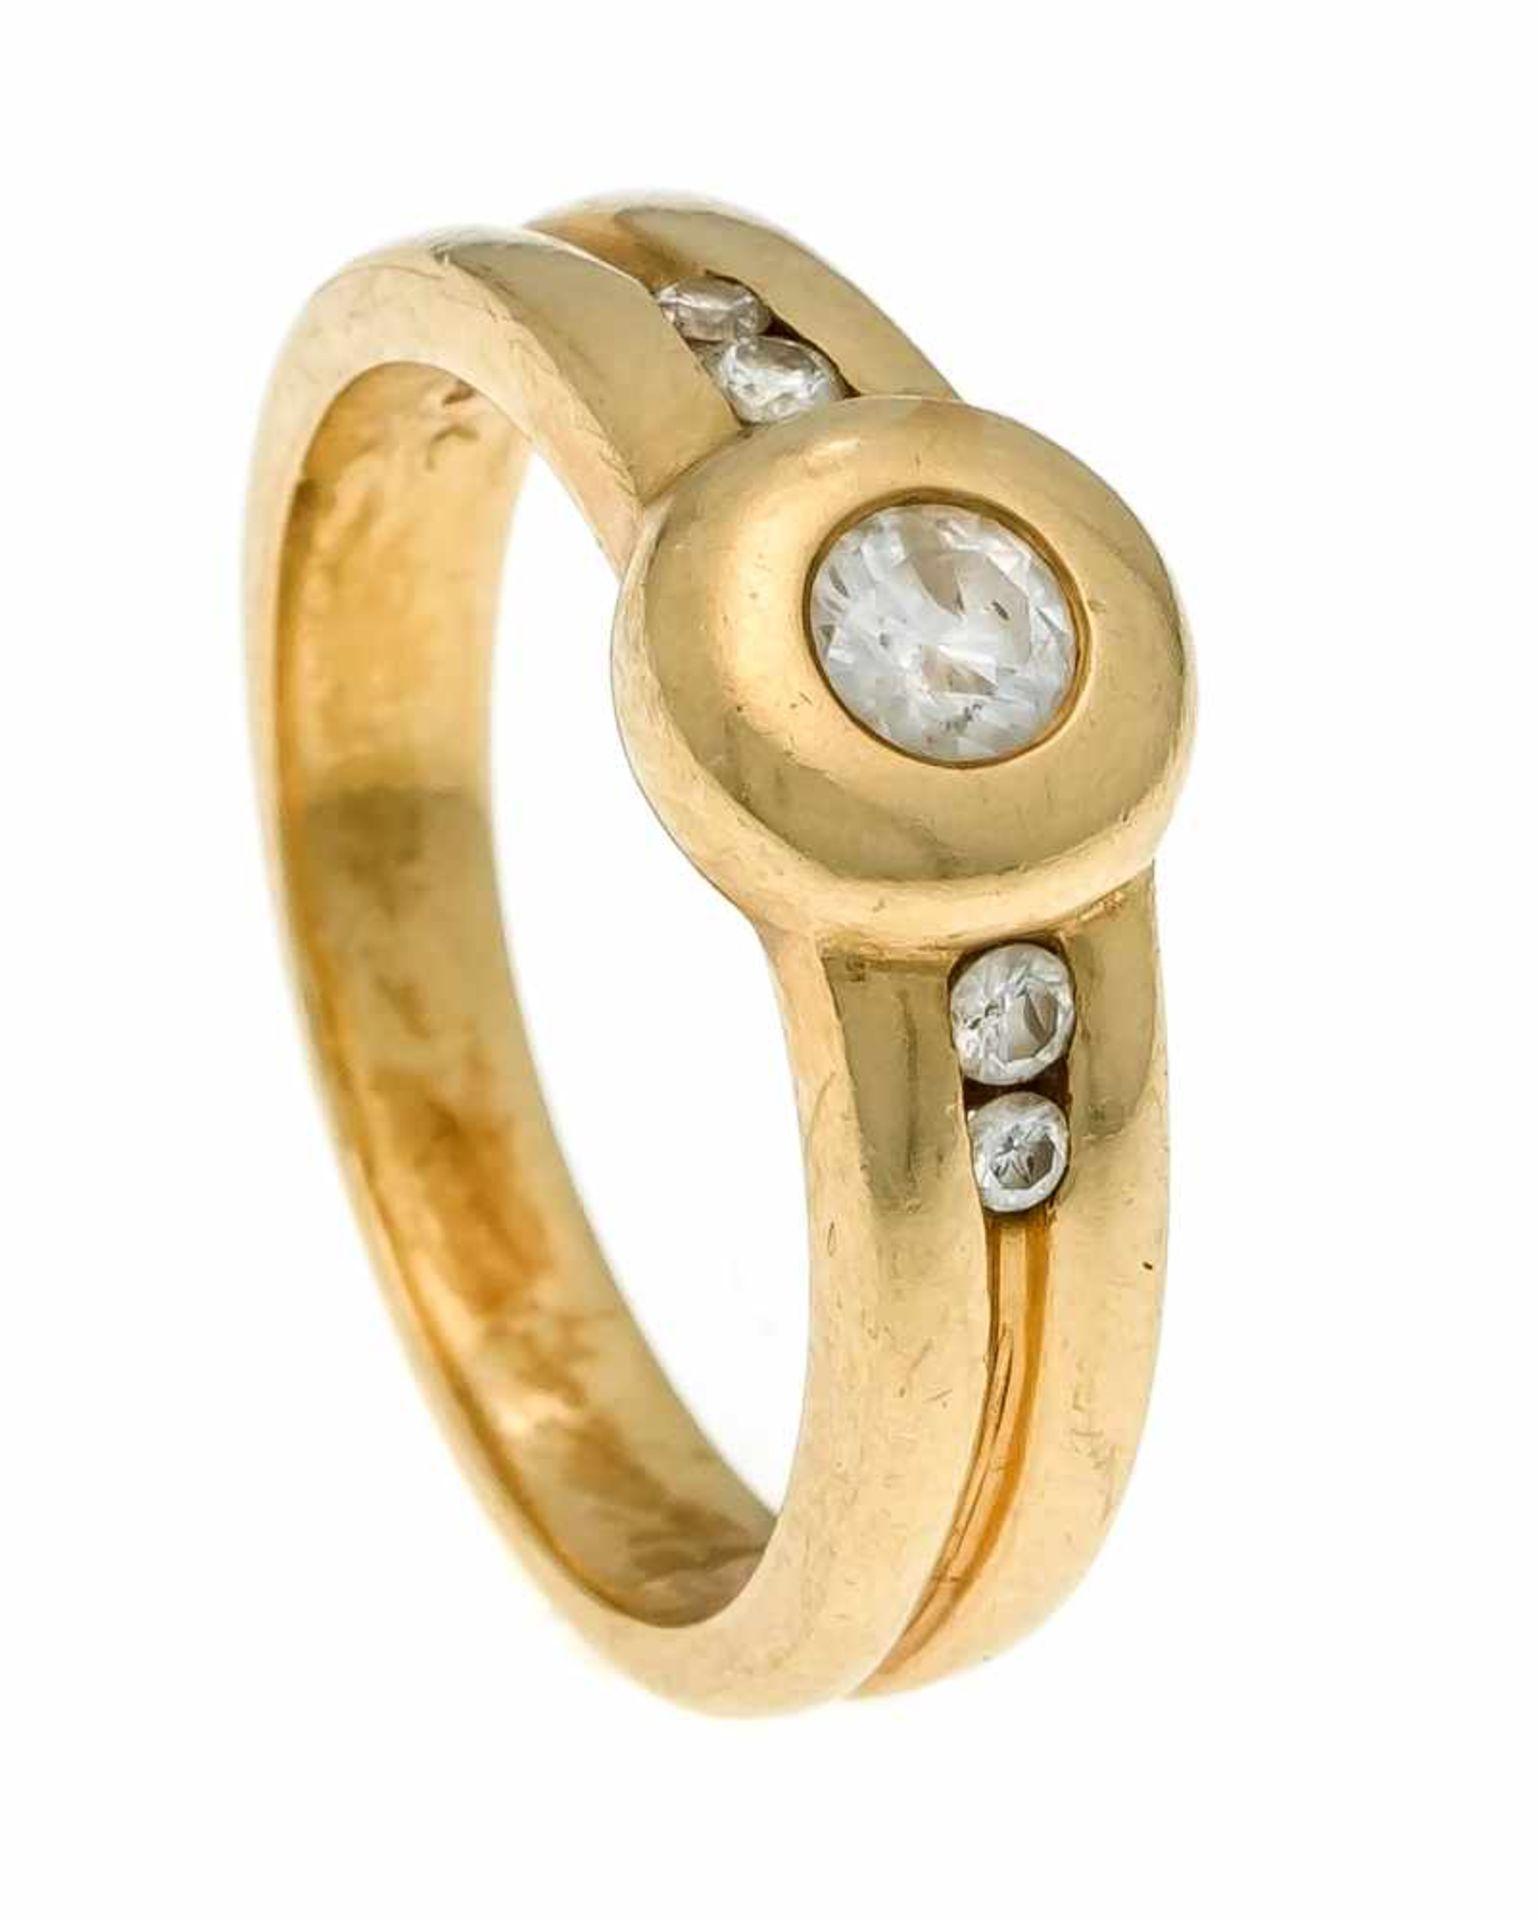 Brillant-Ring GG 585/000 mit 5 Brillanten, zus. 0,28 ct W/PI1, RG 55, 5,9 gDiamond ring, gold 585/